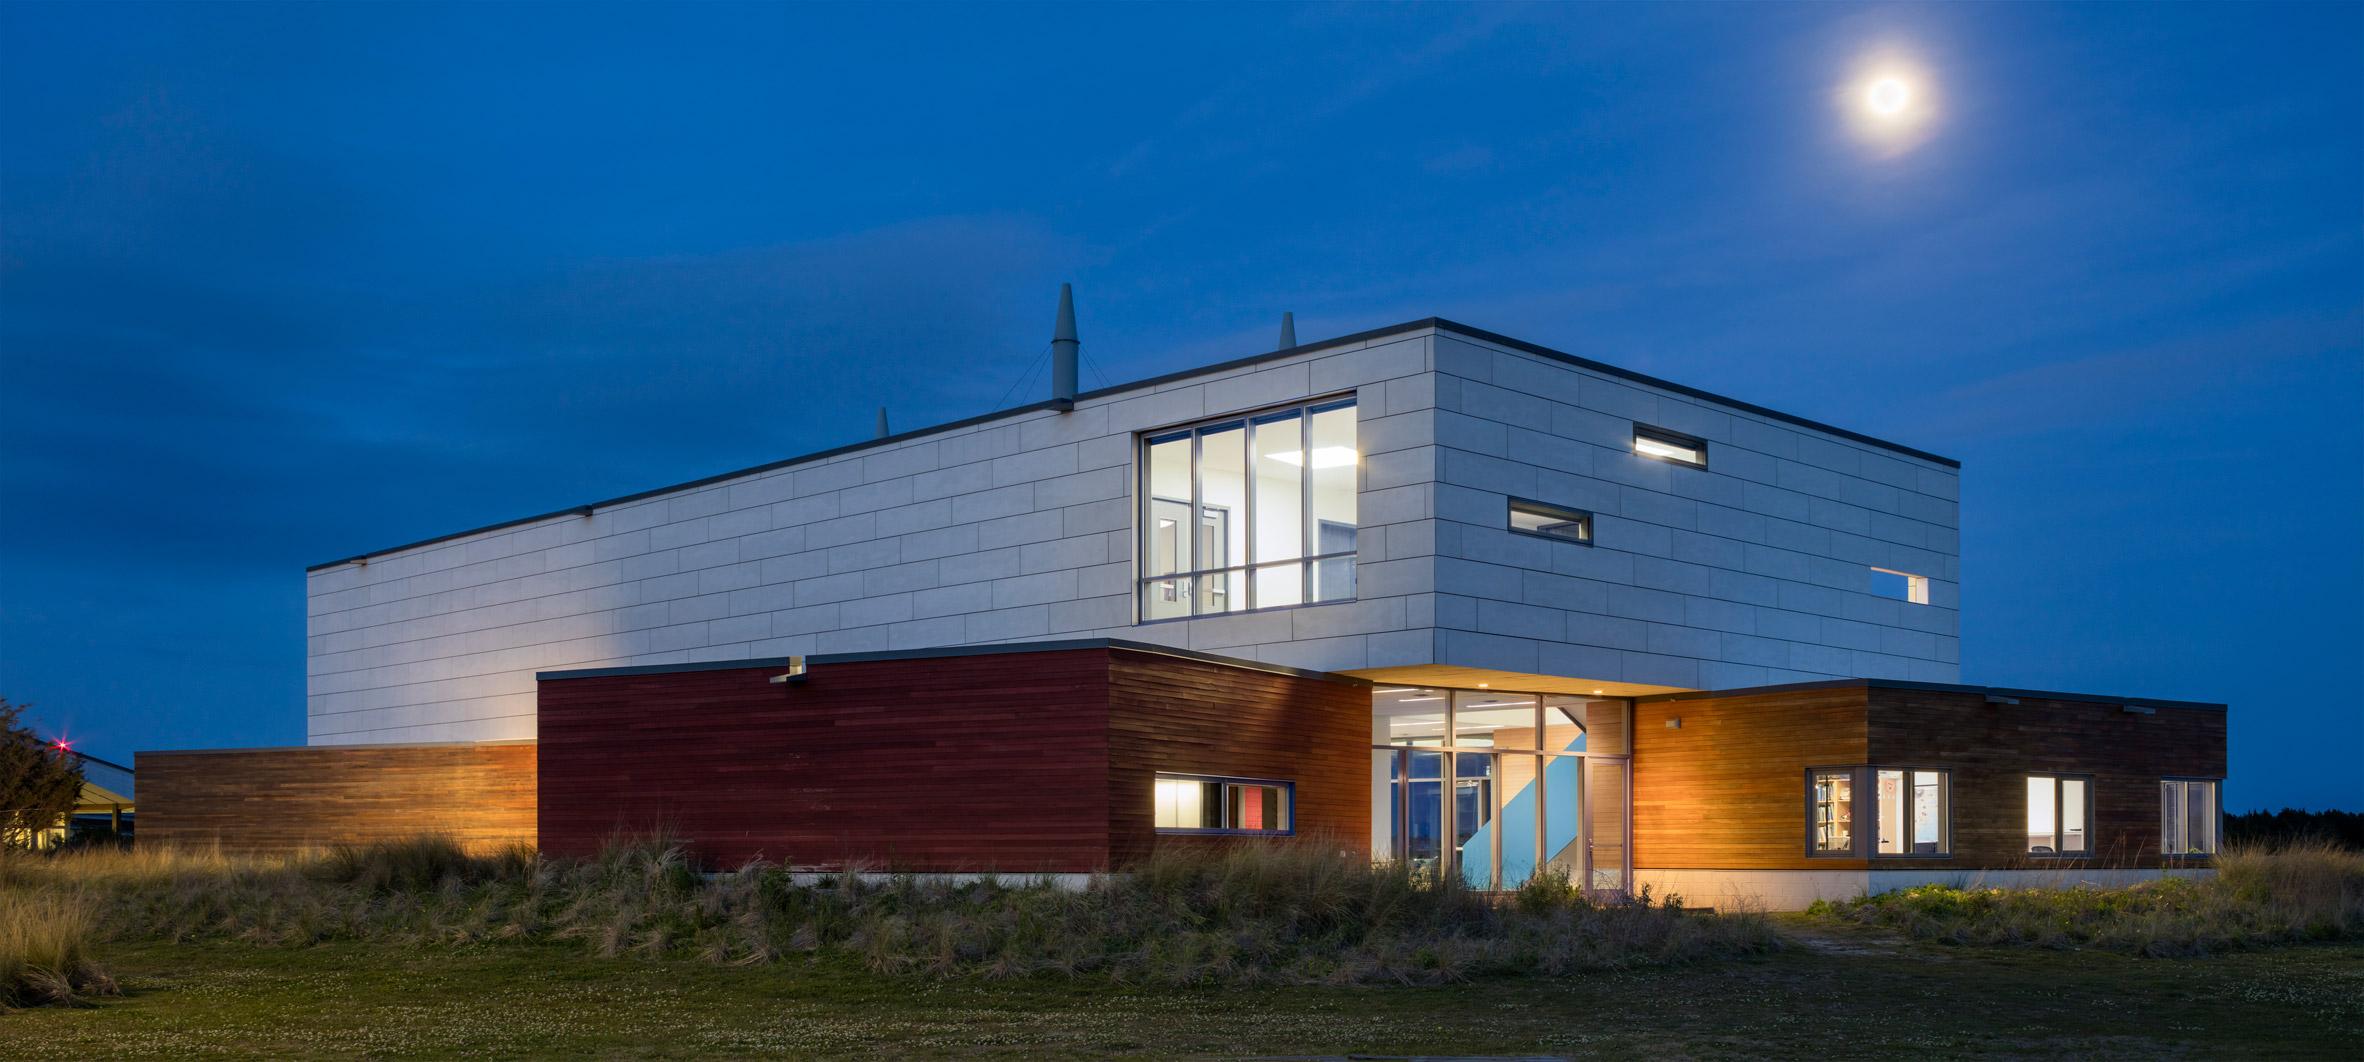 Duke University Marine Lab by GLUCK+ Architecture